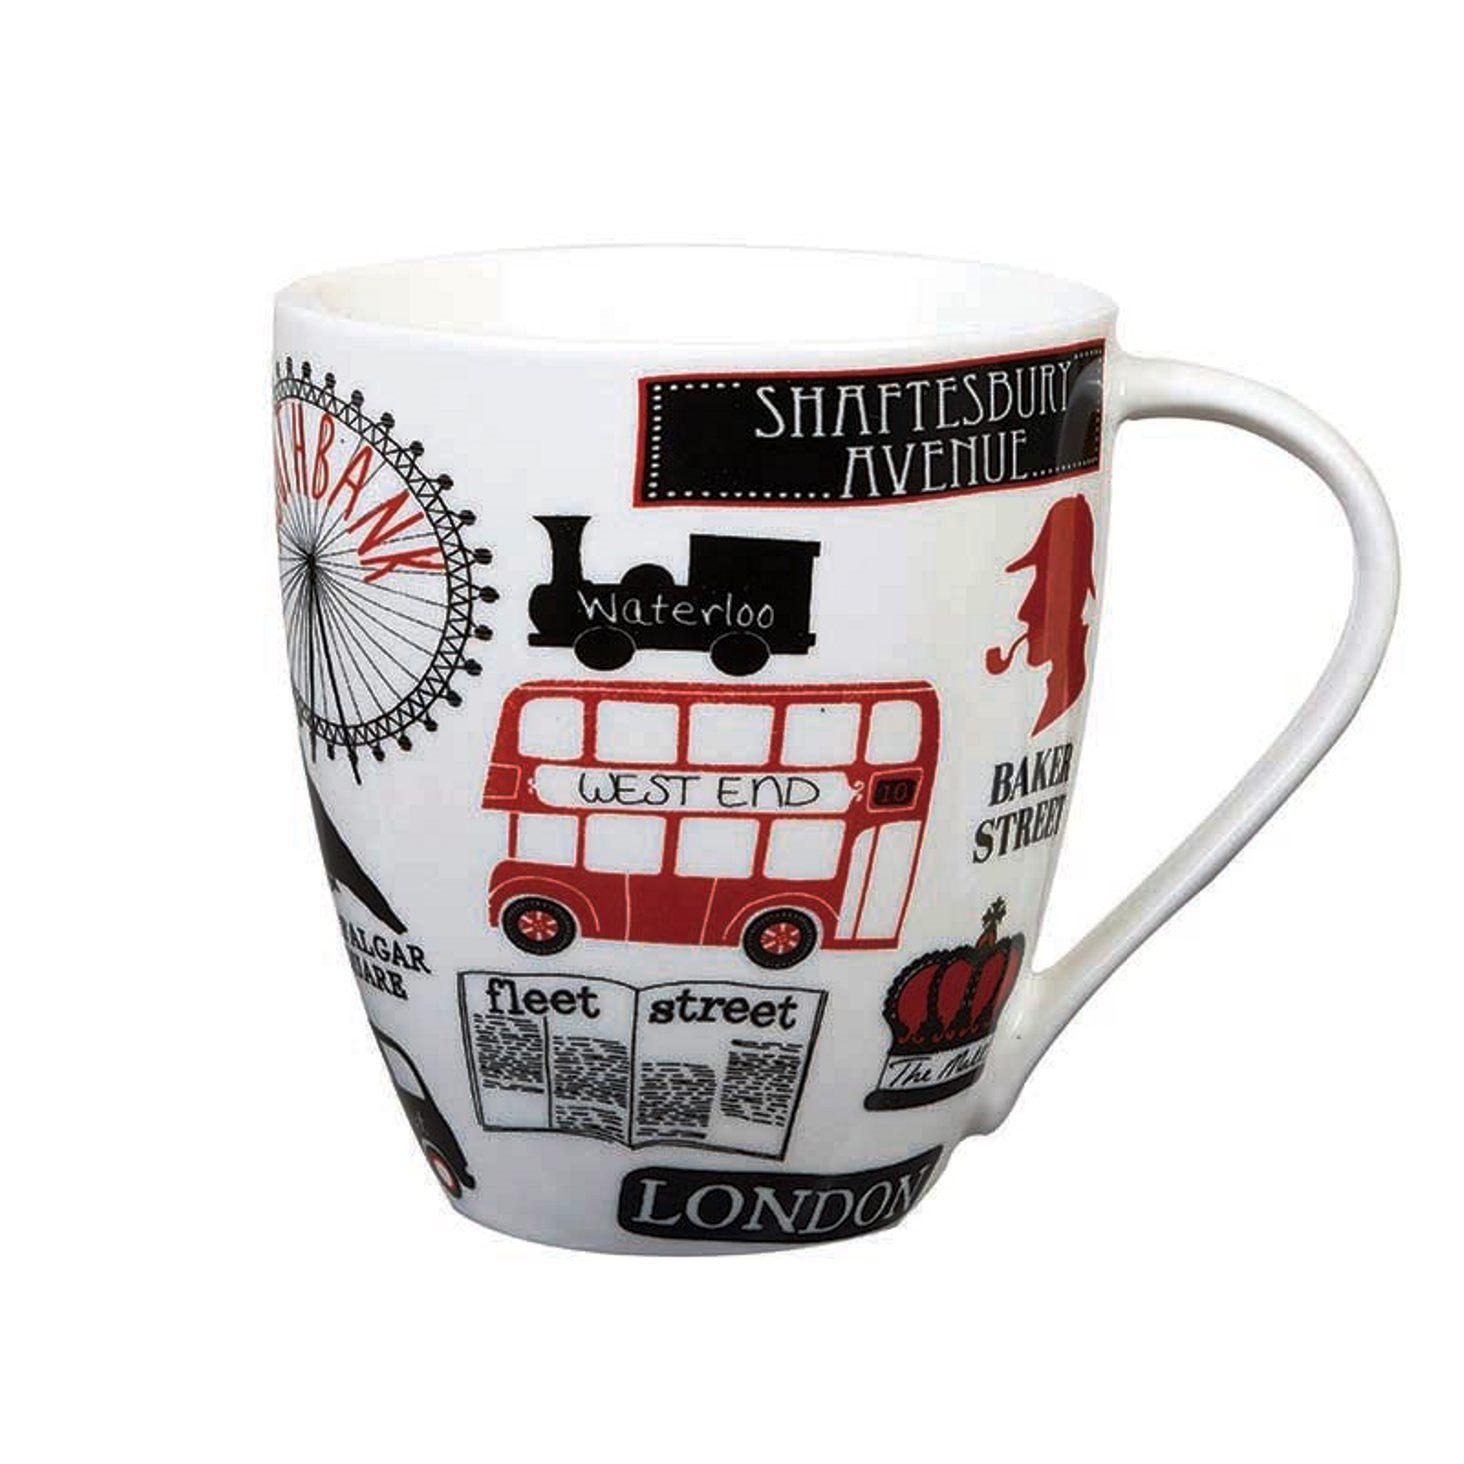 Онлайн каталог PROMENU: Кружка Churchill JAMES SADLER LONDON LIFE, объем 0,5 л, белый                               JSLC00541